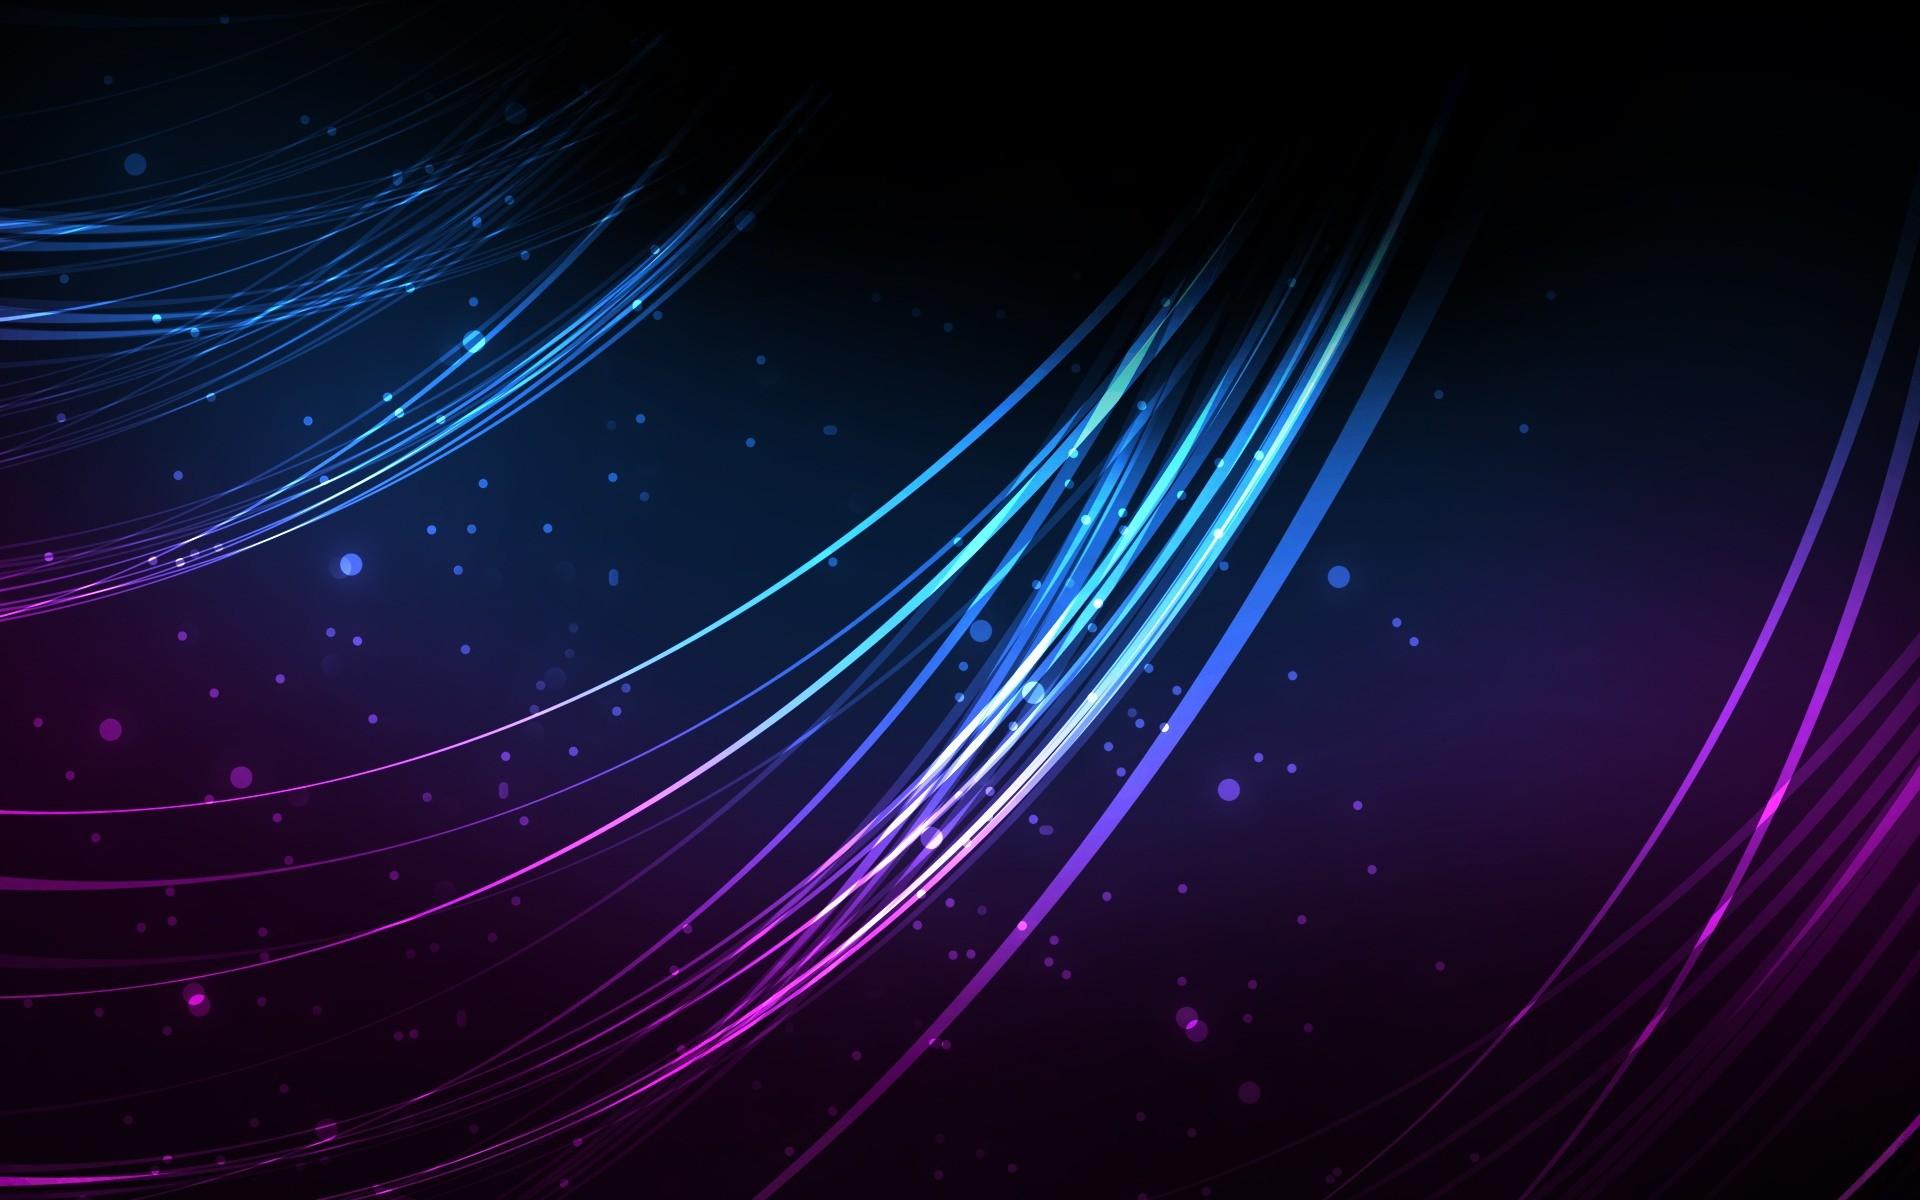 … purple and blue strands desktop wallpaper …